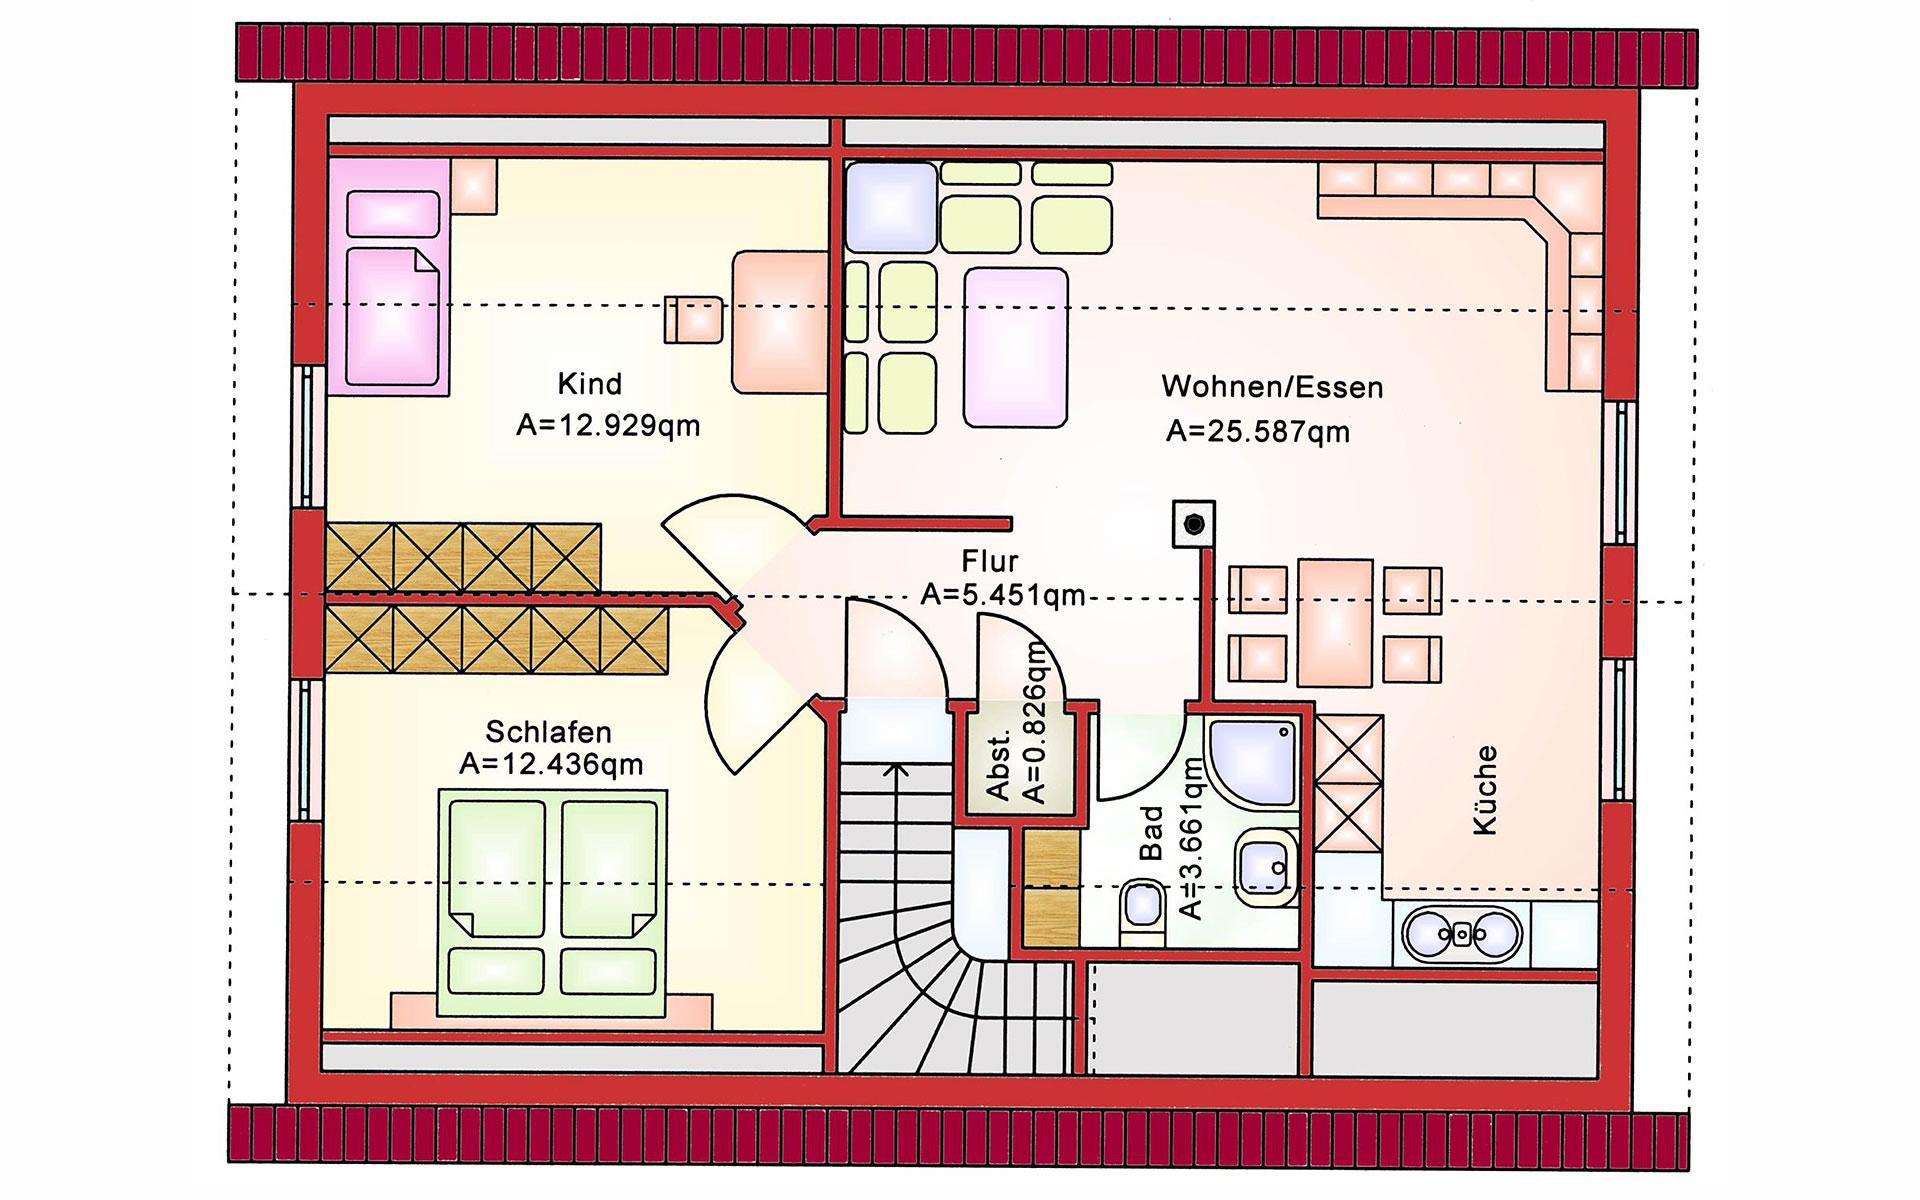 Dachgeschoss Zweifamilienhaus BS 140 von B&S Selbstbausysteme GmbH & Co. KG